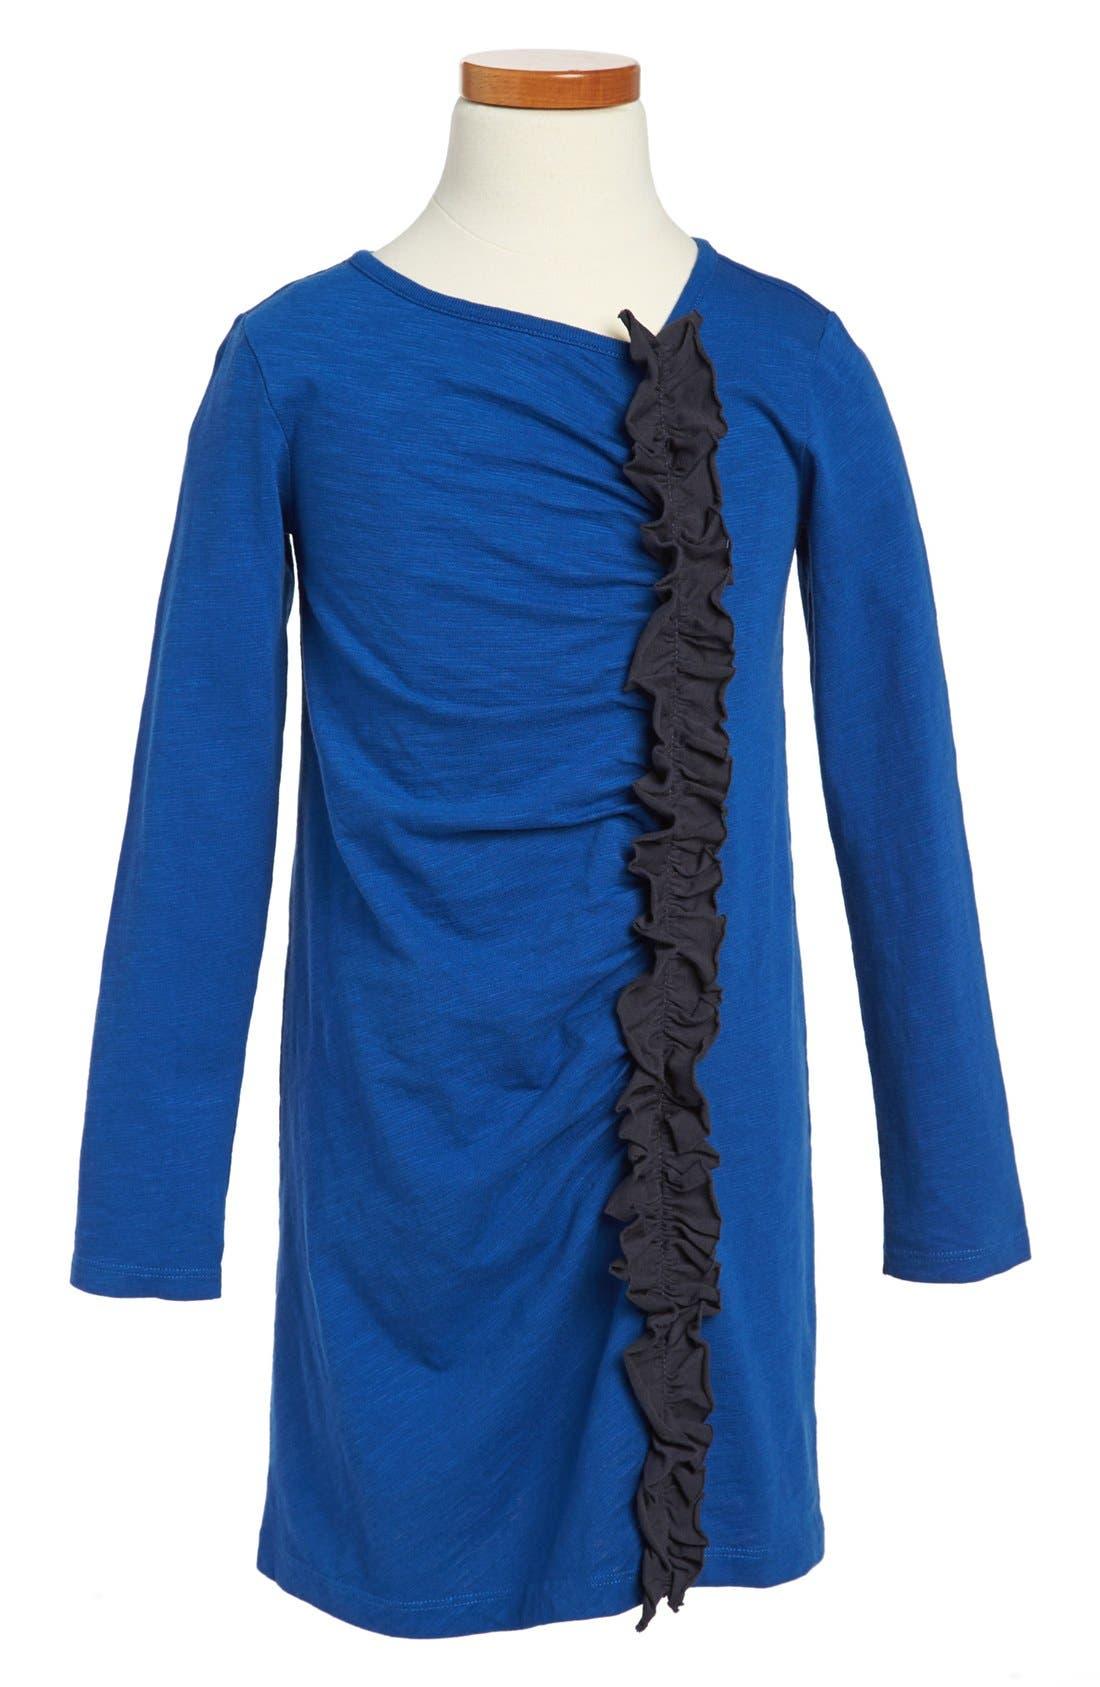 Alternate Image 1 Selected - Tea Collection Ruffled Shift Dress (Little Girls & Big Girls)